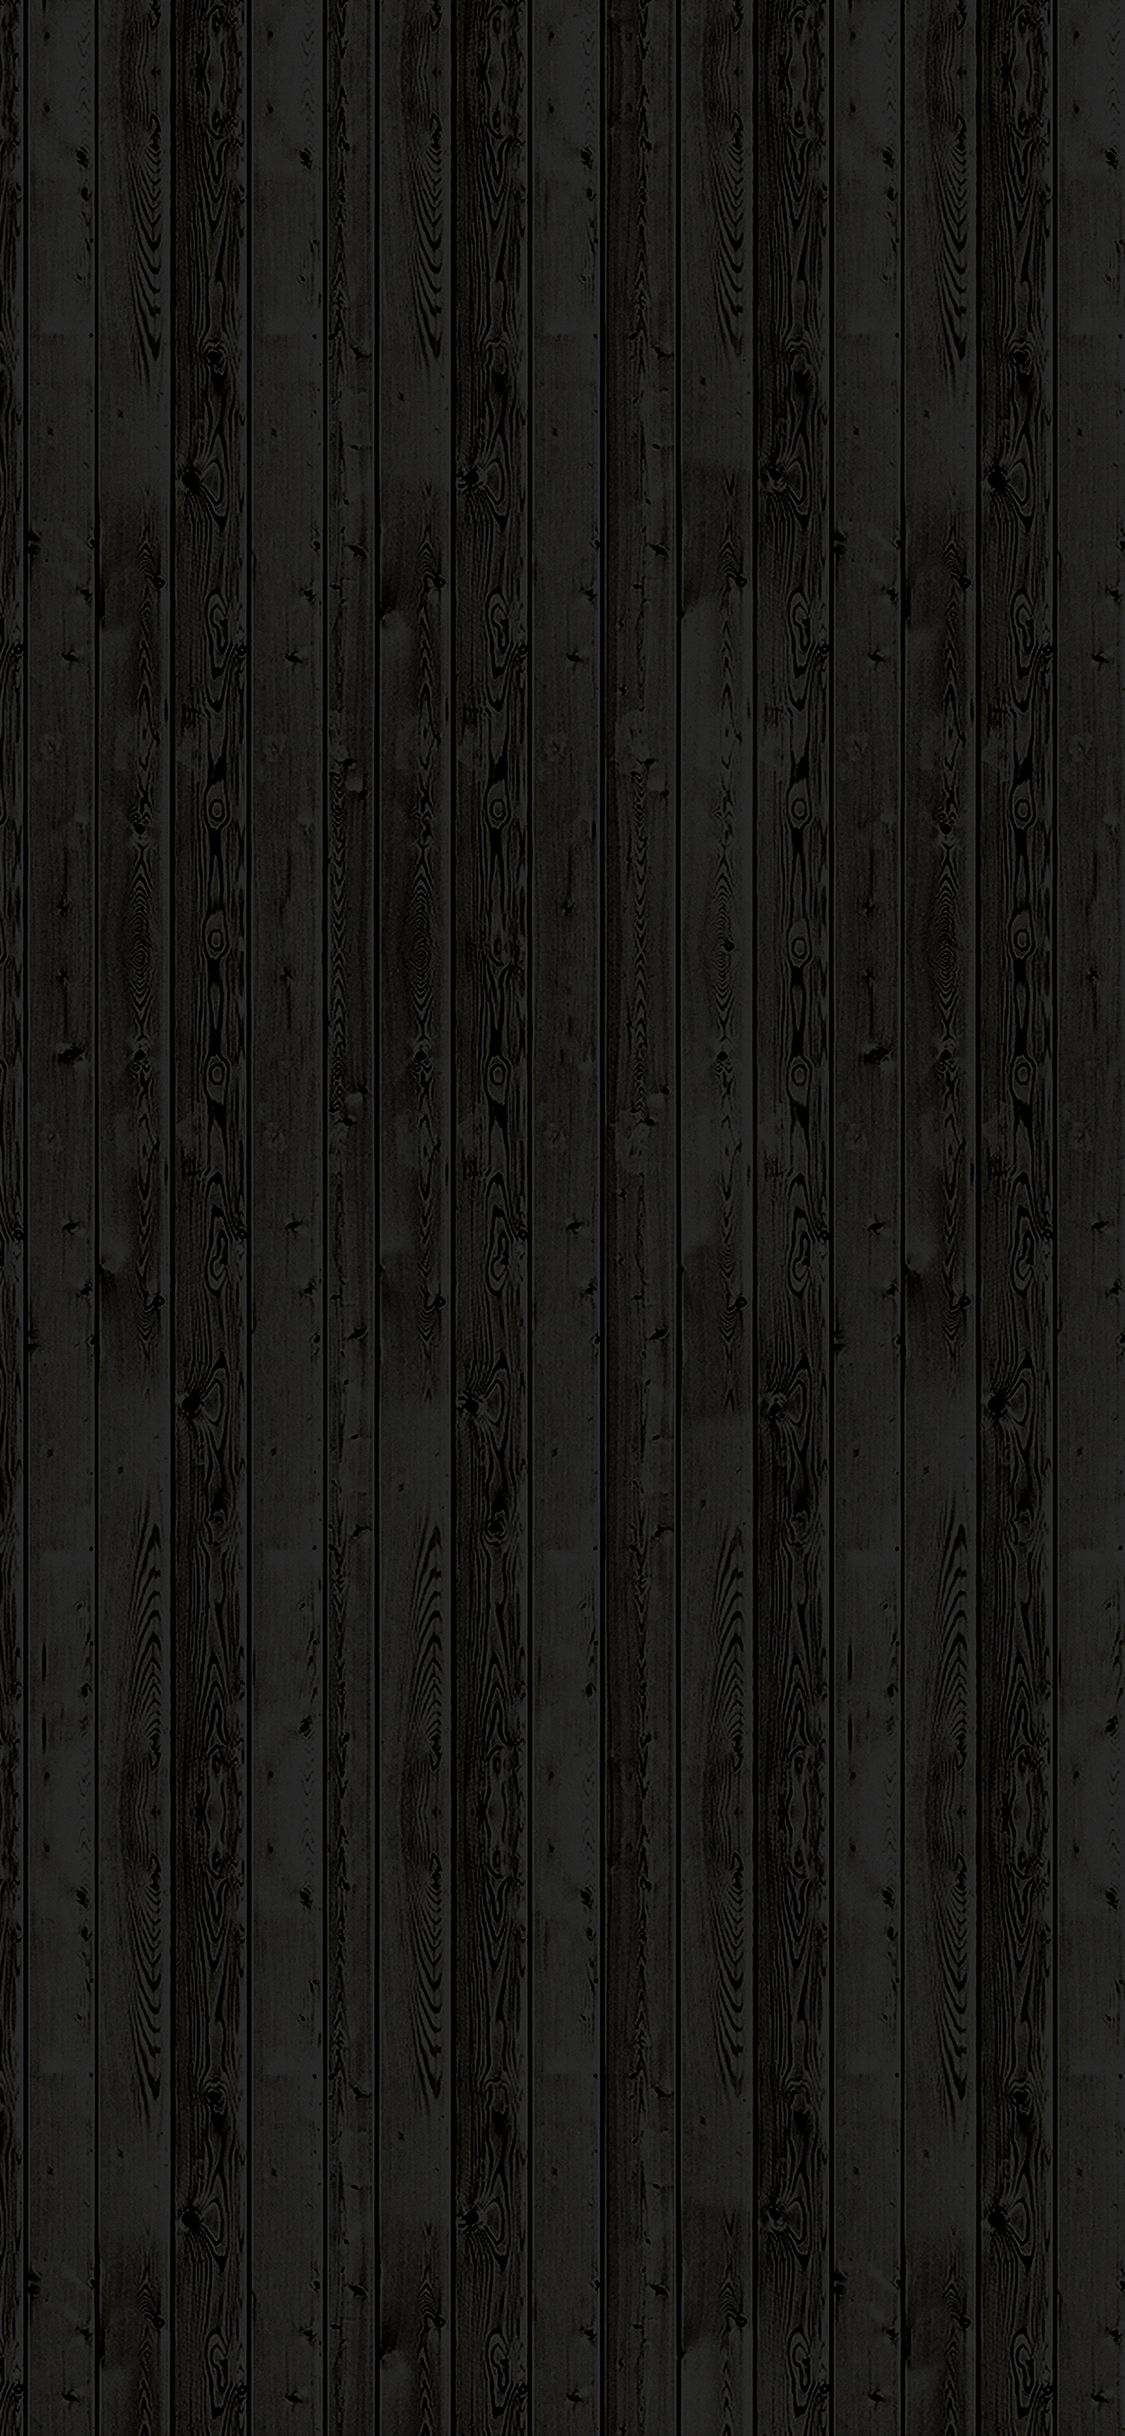 iPhoneXpapers.com-Apple-iPhone-wallpaper-vd51-wooden-floor-black-pattern-natural-dark